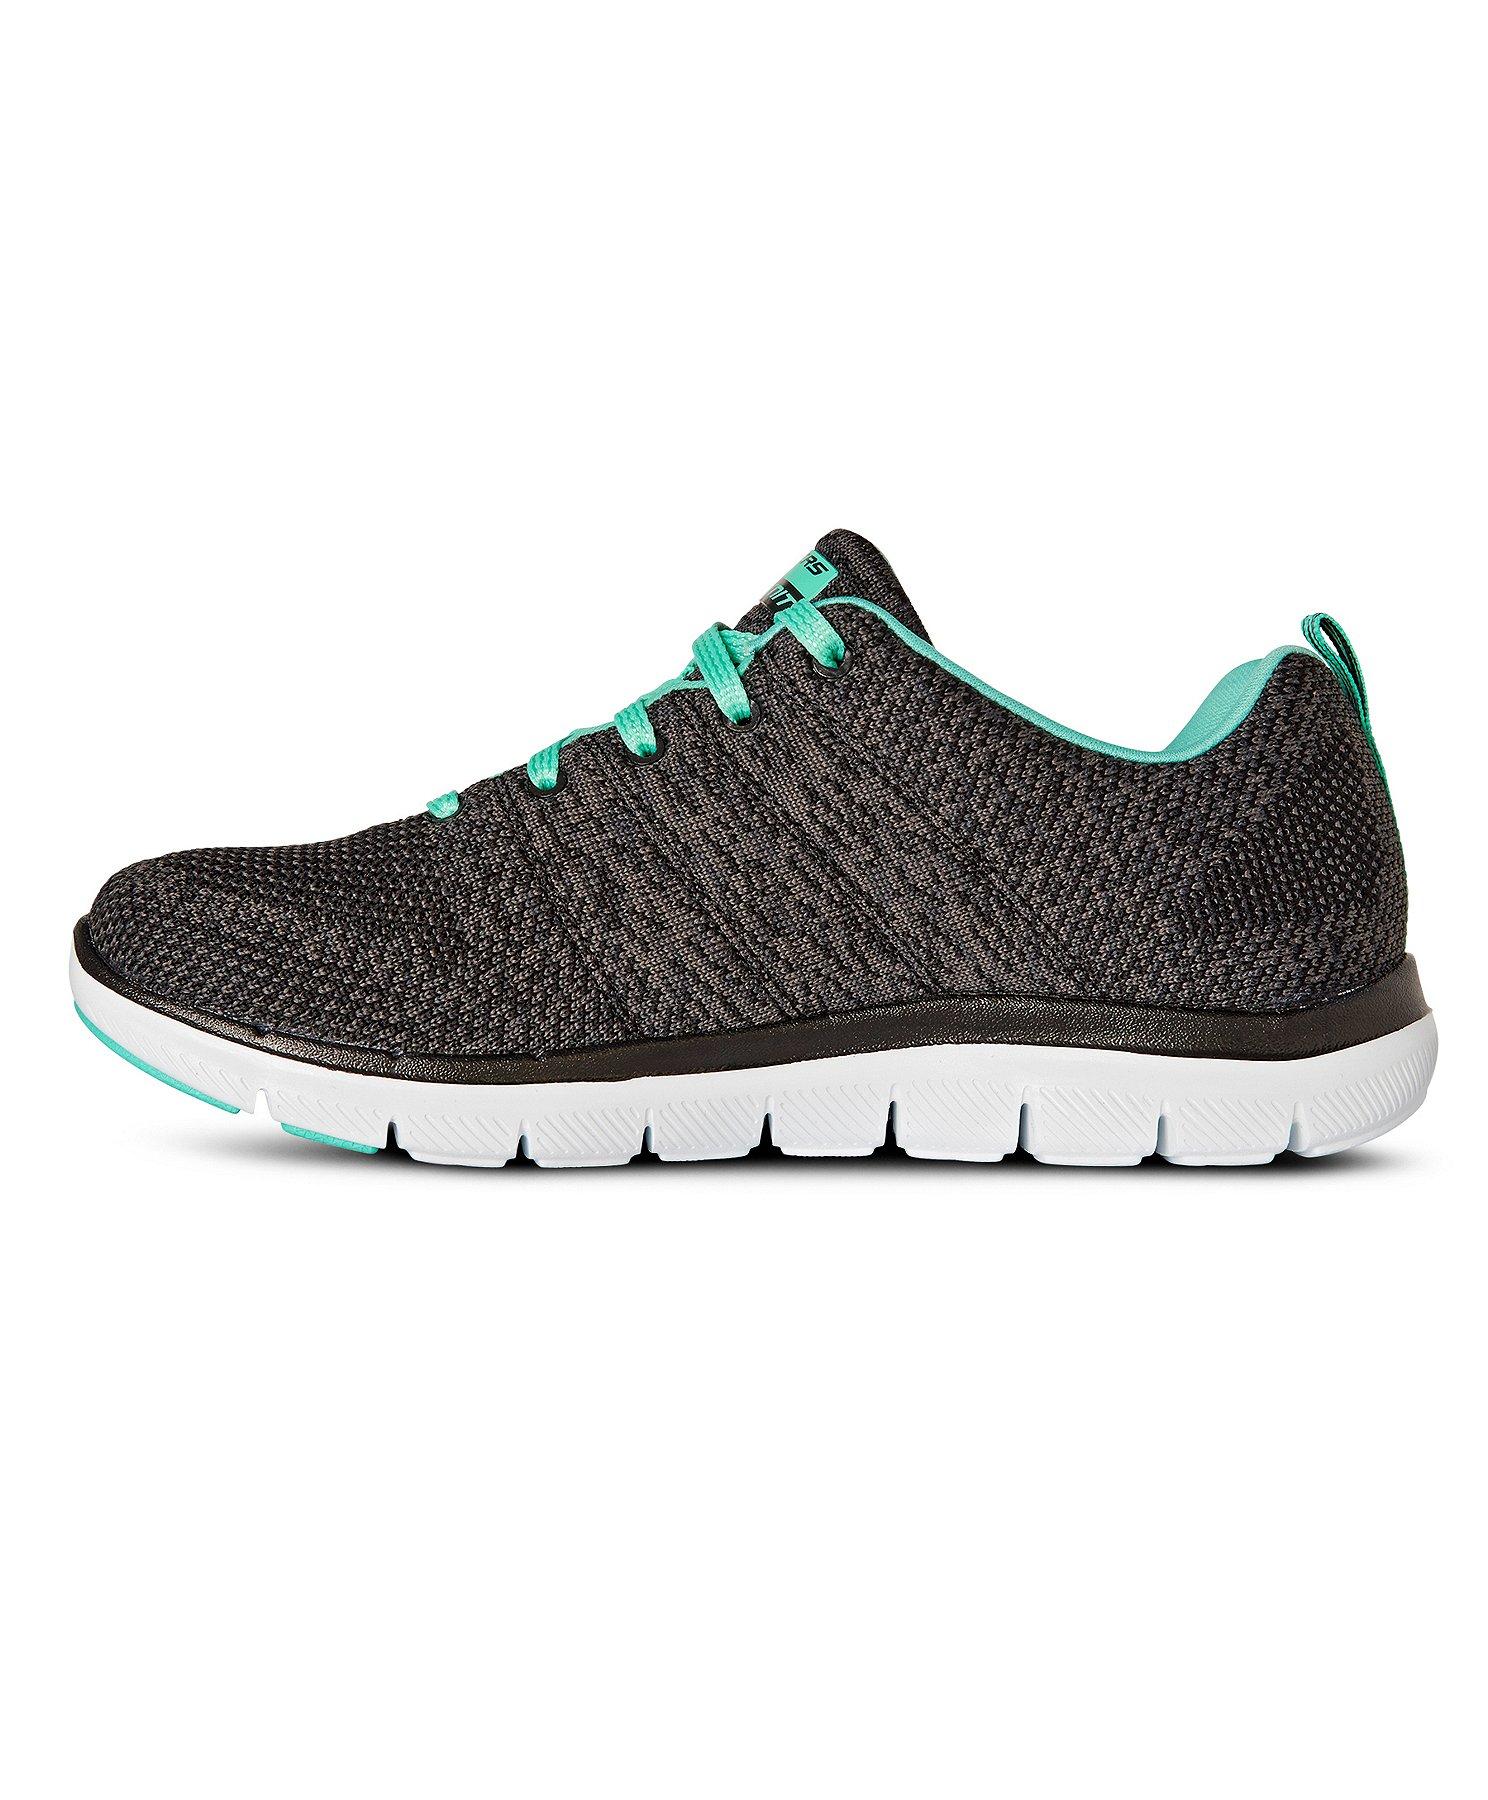 Sport Appeal Pour High Chaussures De 0 2 Energy FemmesFlex CeWQdBorx